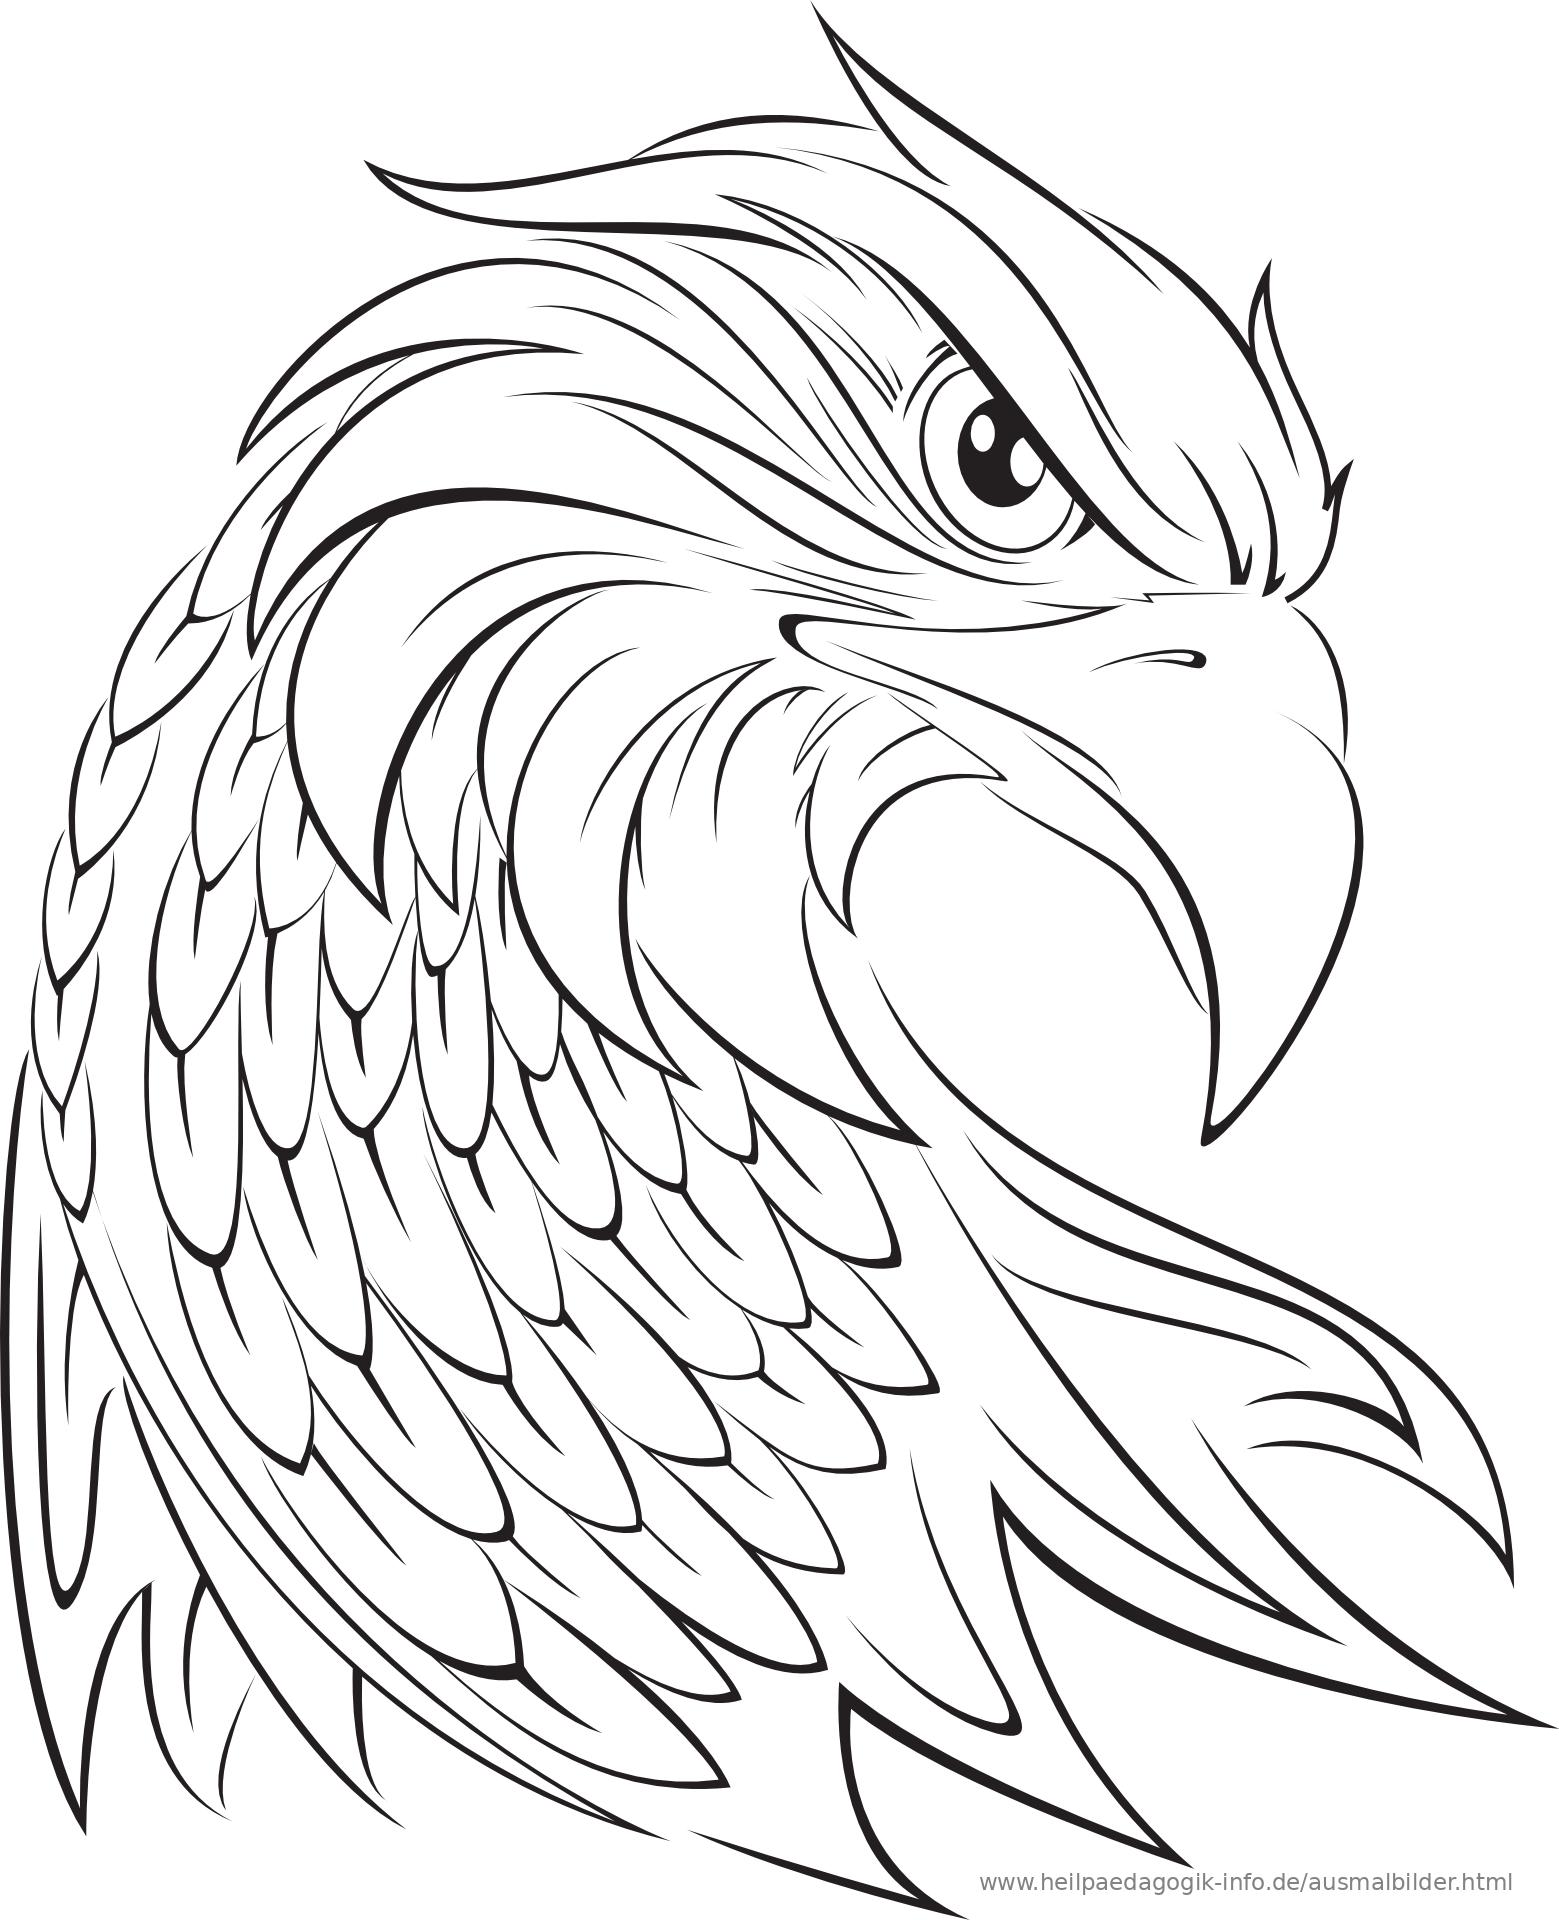 Ausmalbilder Vogel